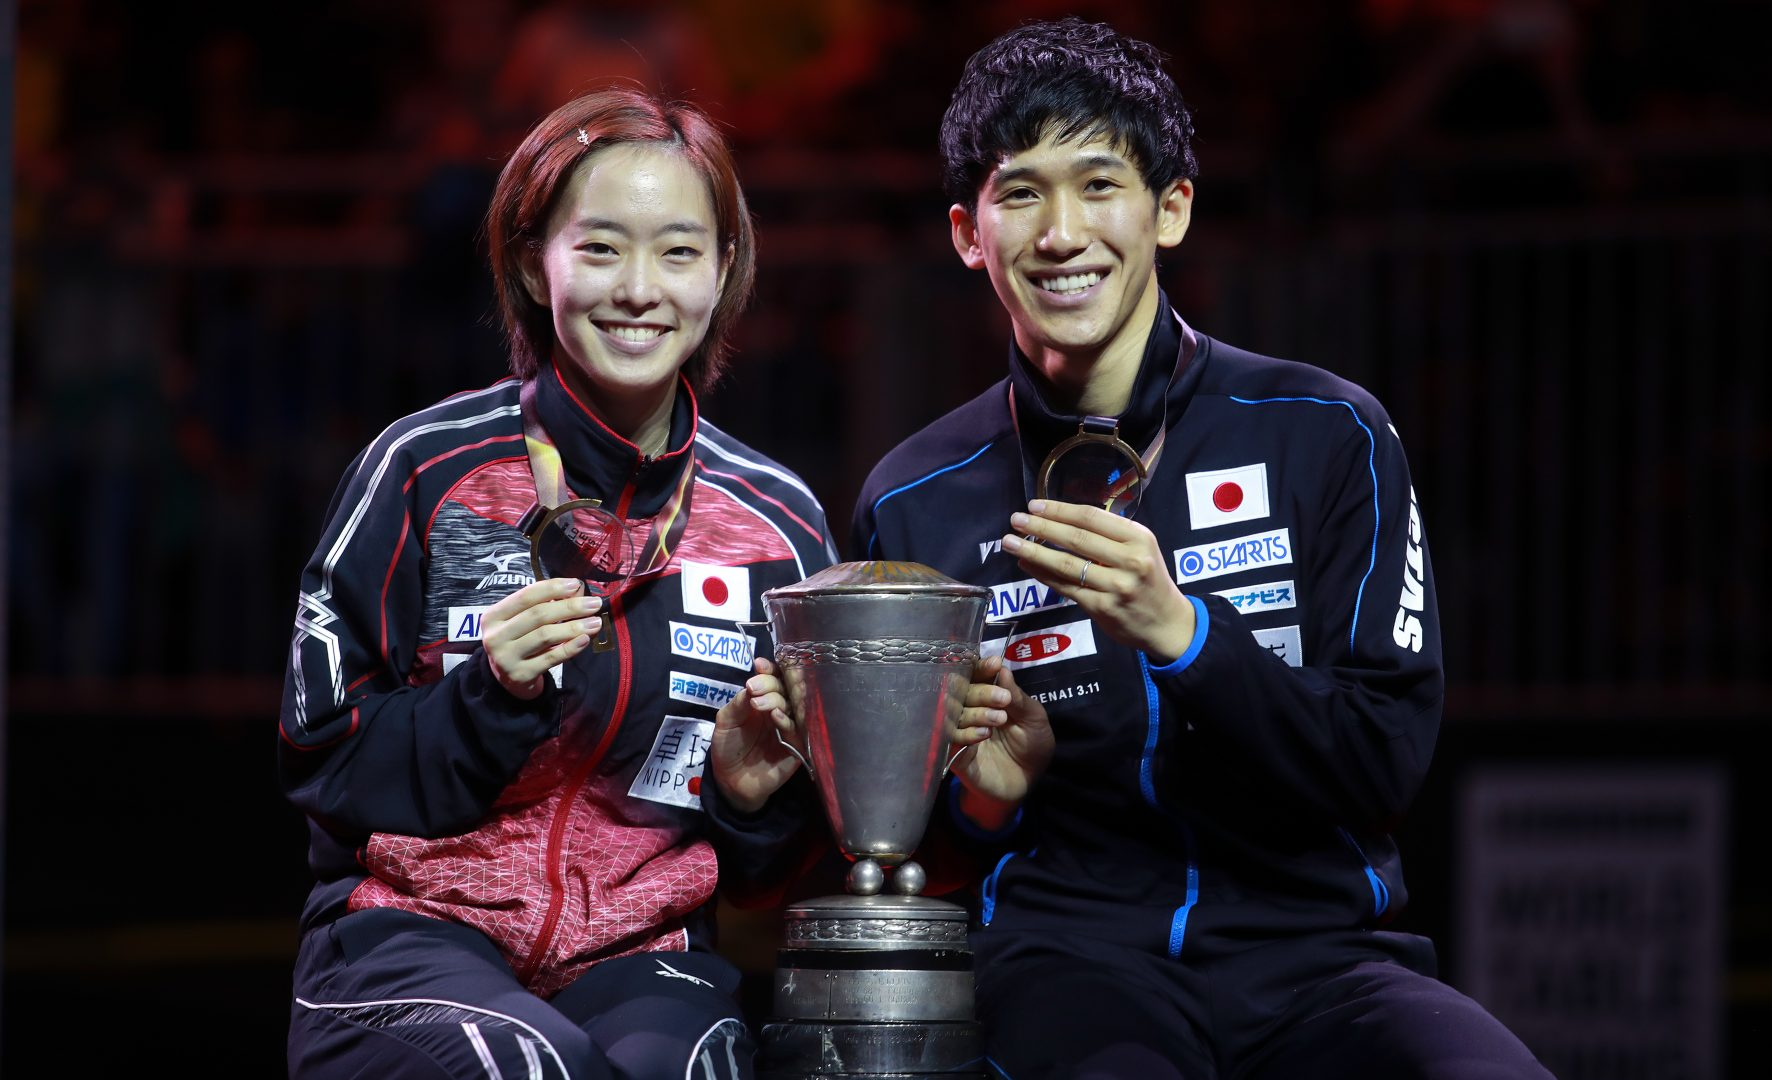 世界卓球選手権大会 歴代チャンピオン・男子結果一覧